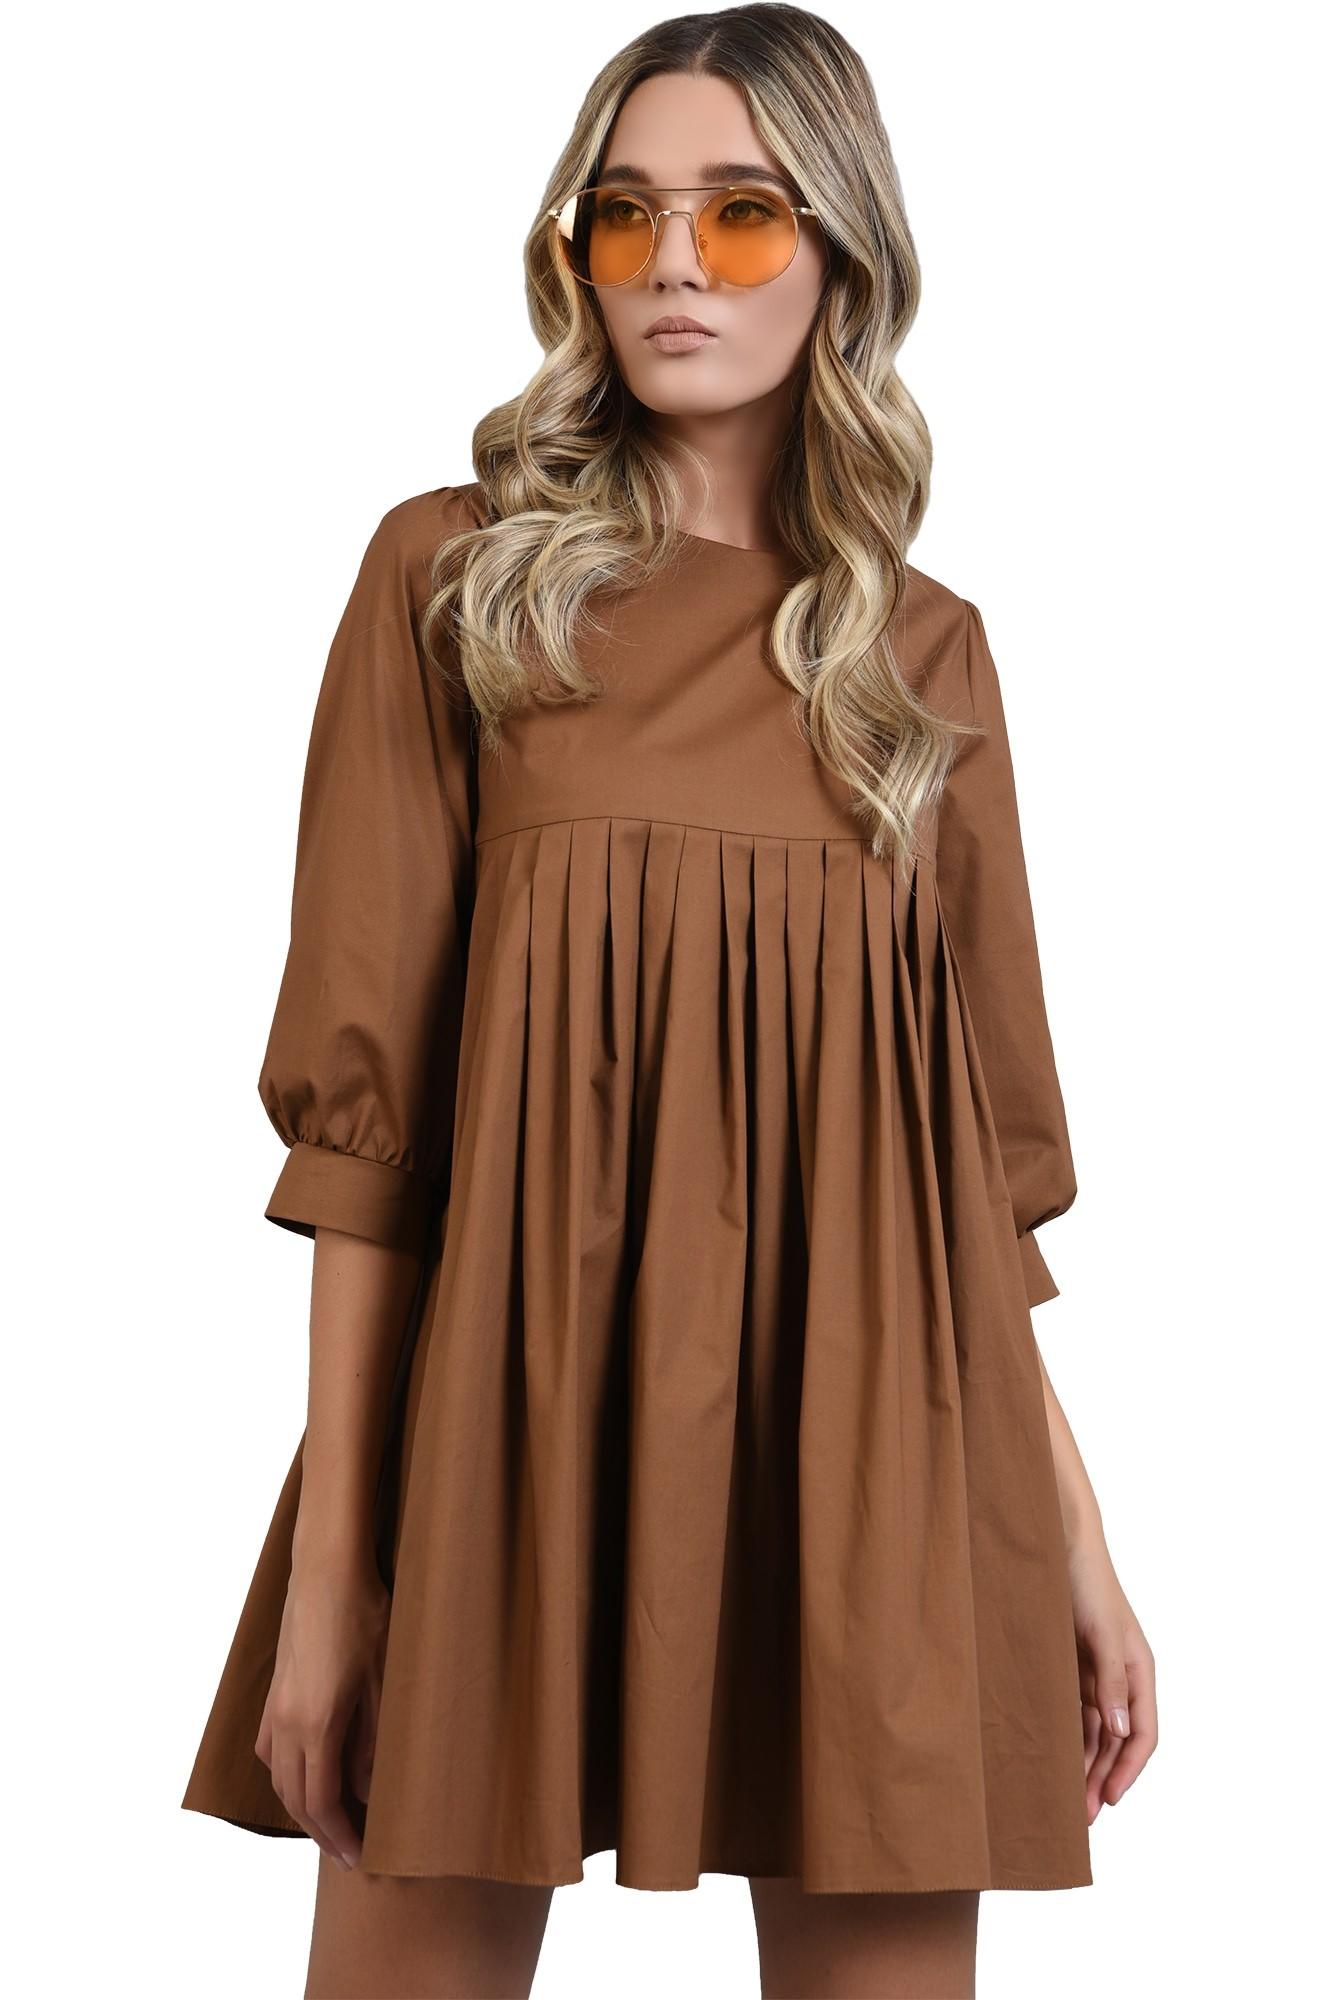 3 - rochie maro, din bumbac, cu pliuri, Poema